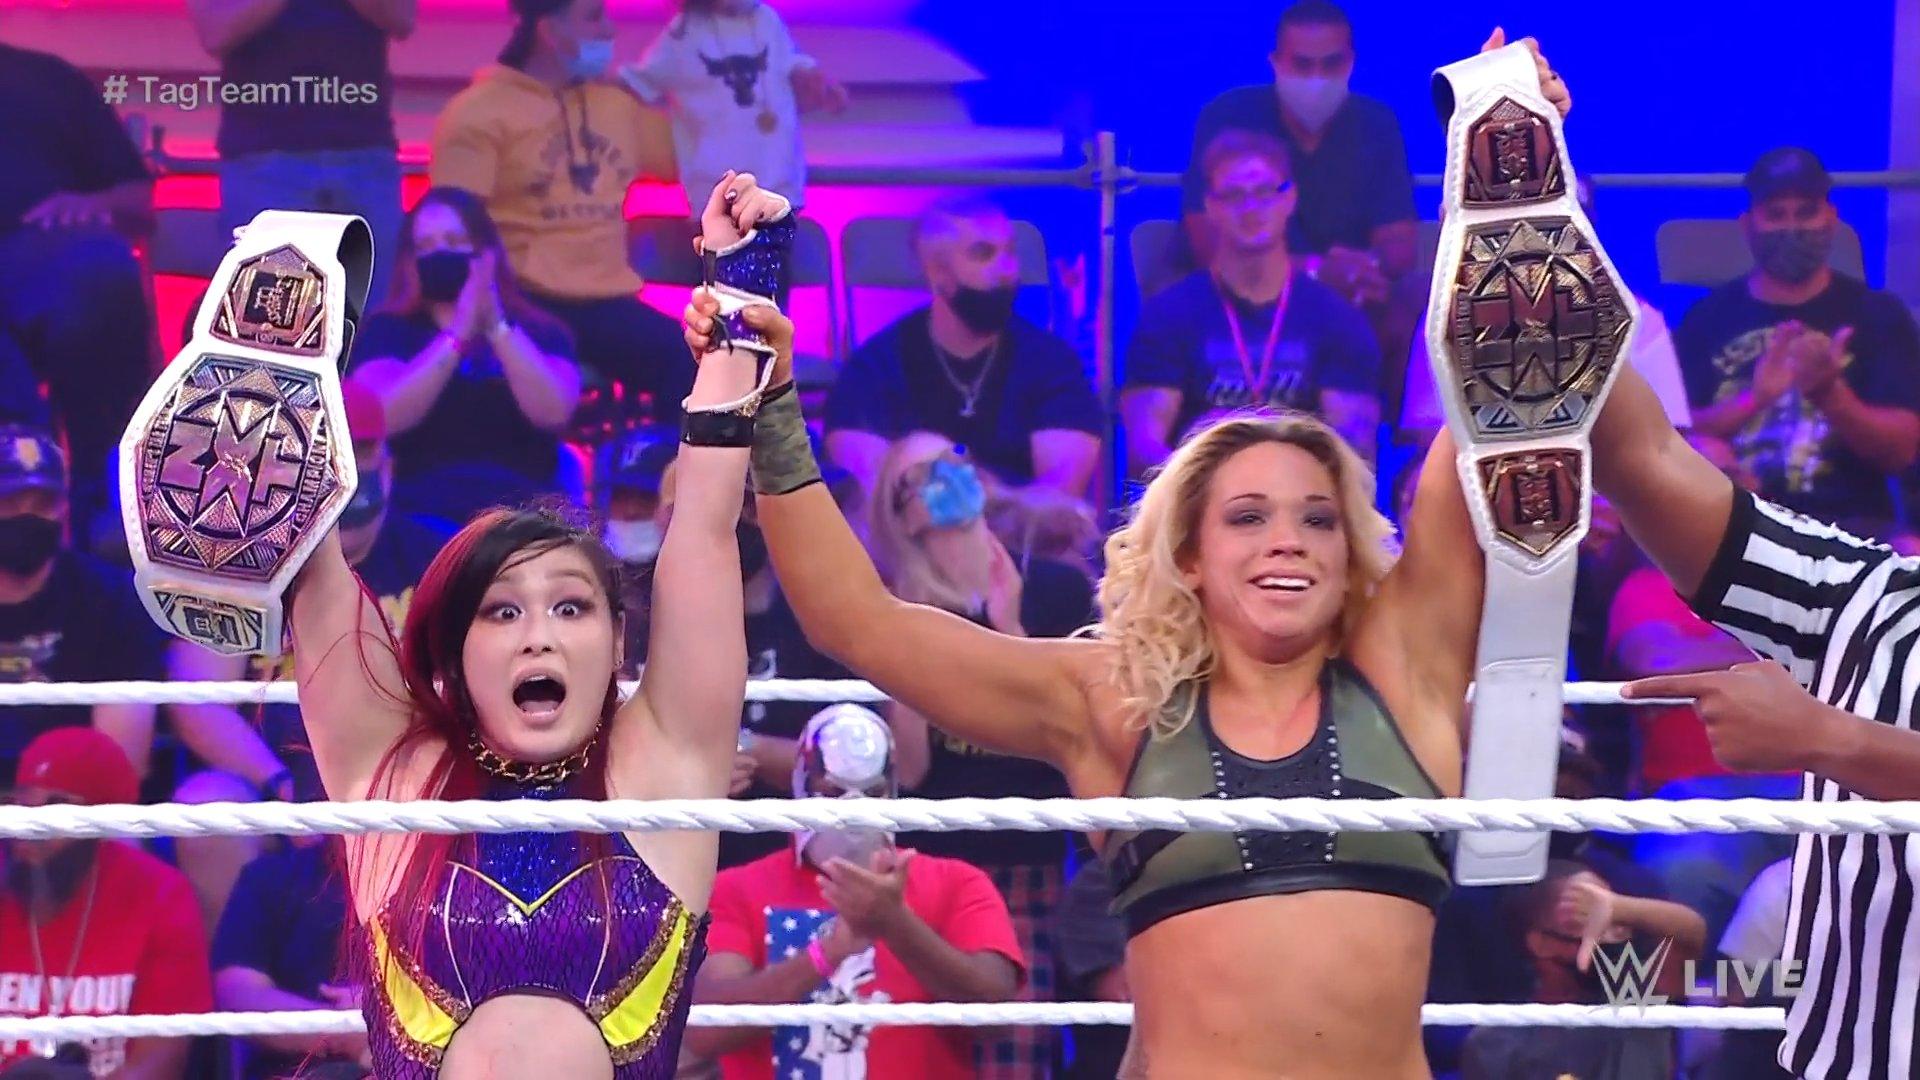 NXT 2.0: Io Shirai and Zoey Stark retain before Toxic Attraction